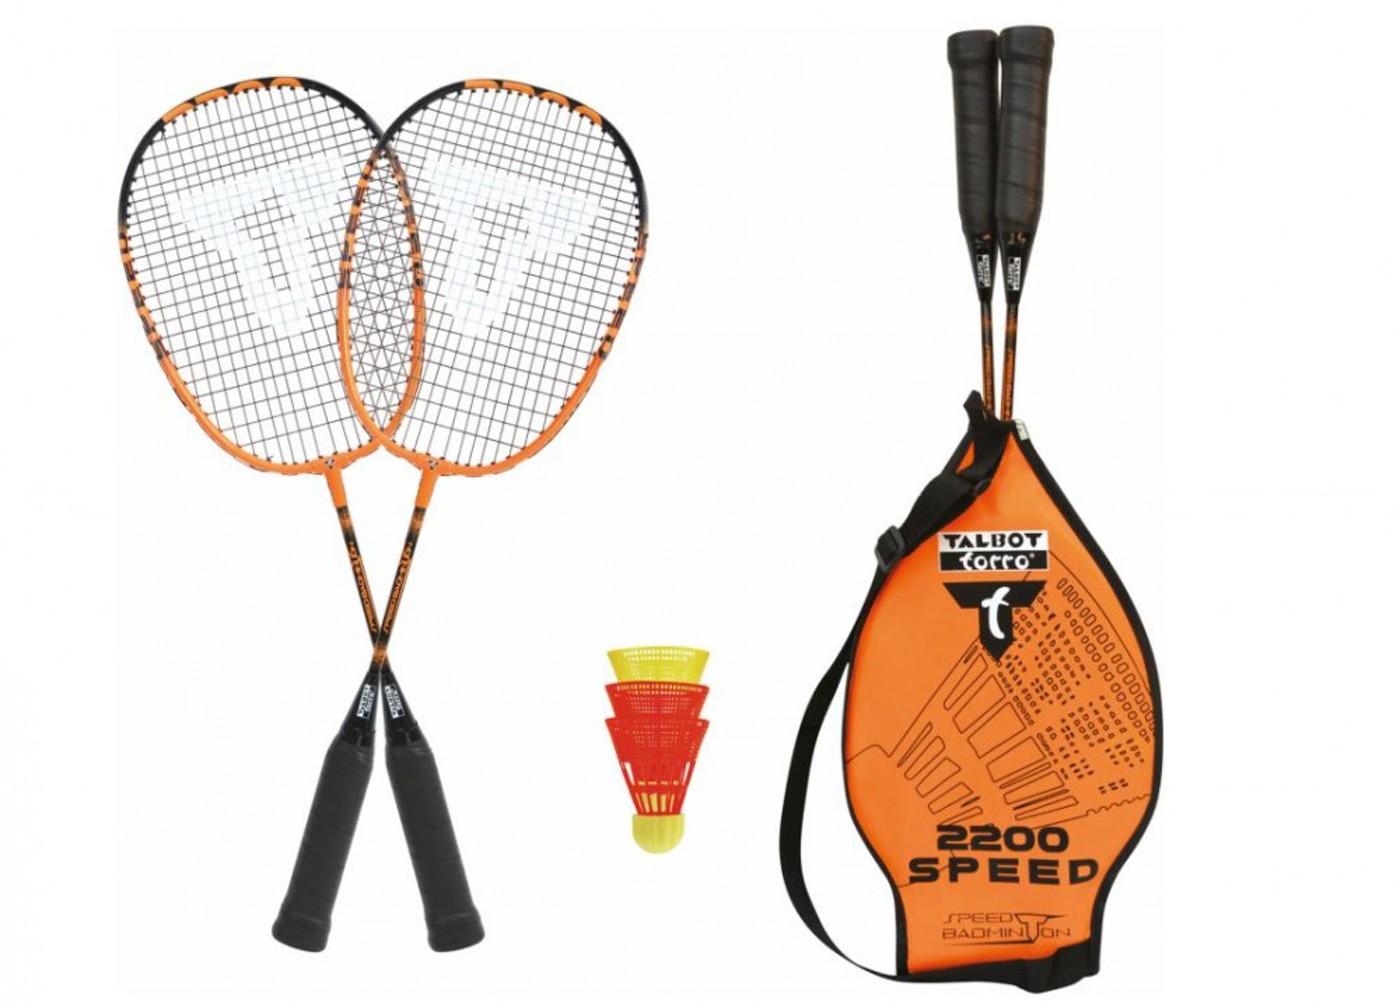 TALBOT TORRO Badminton Set Speed 2200